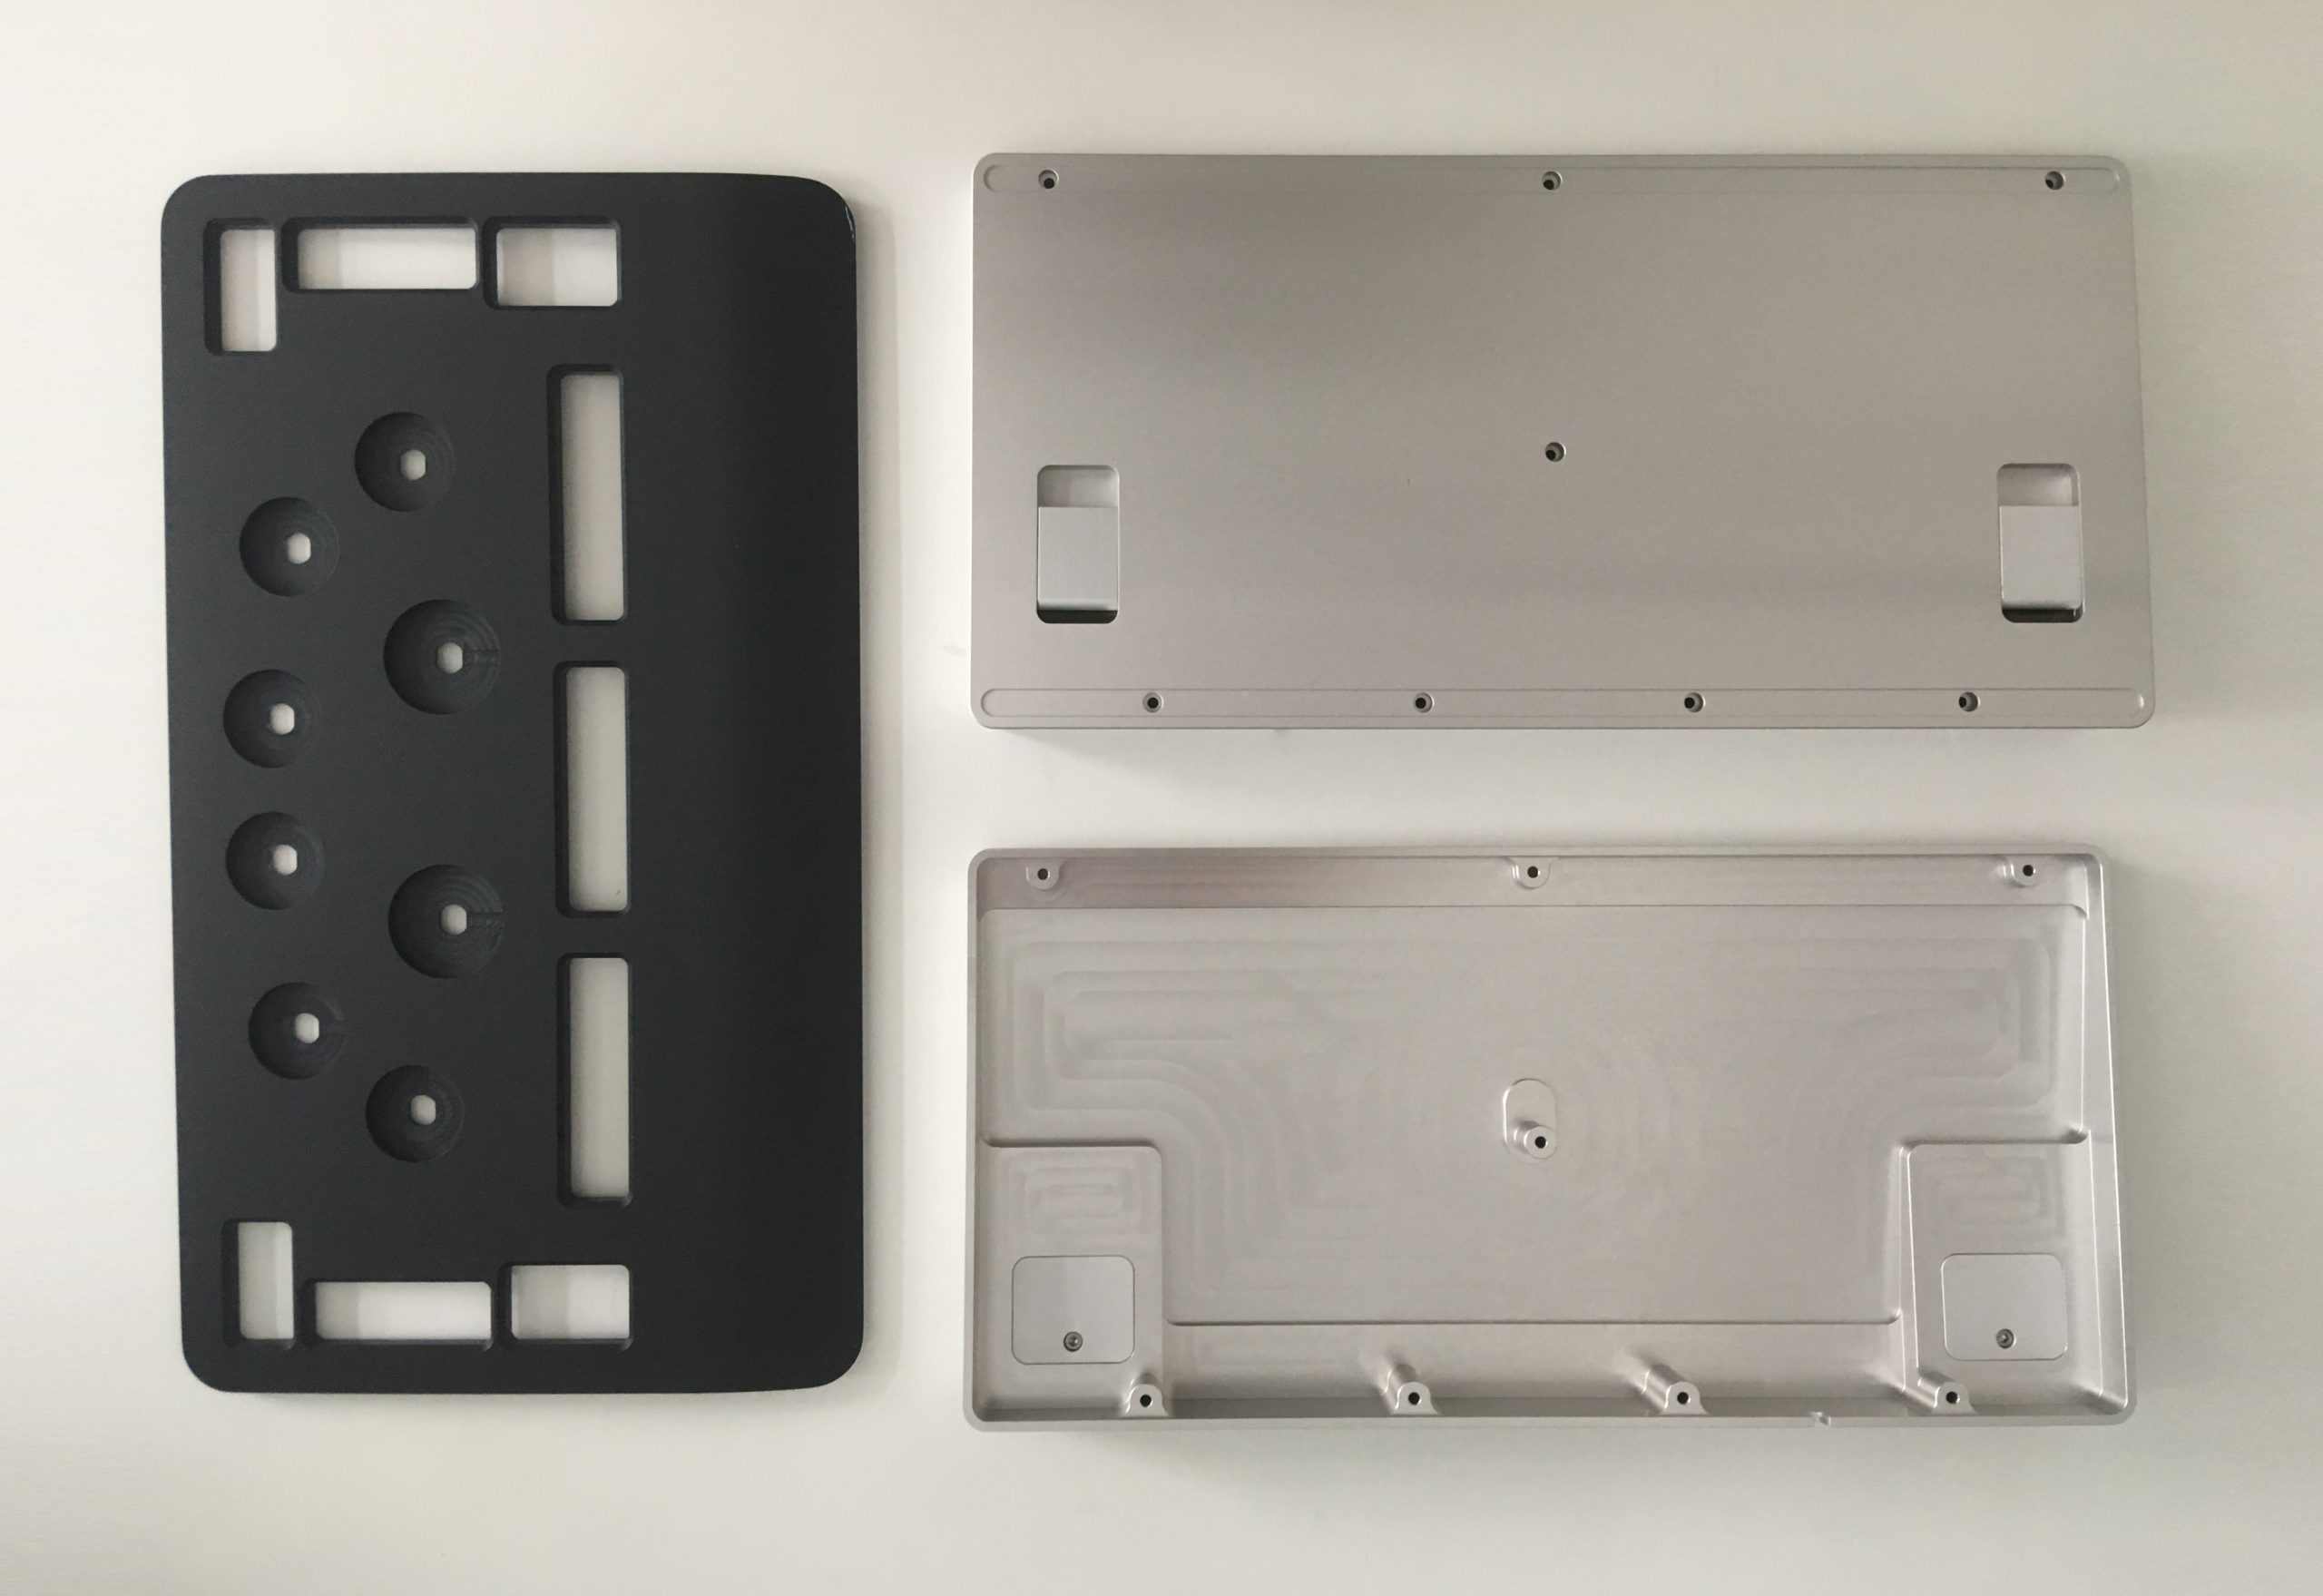 keyboard prototyping